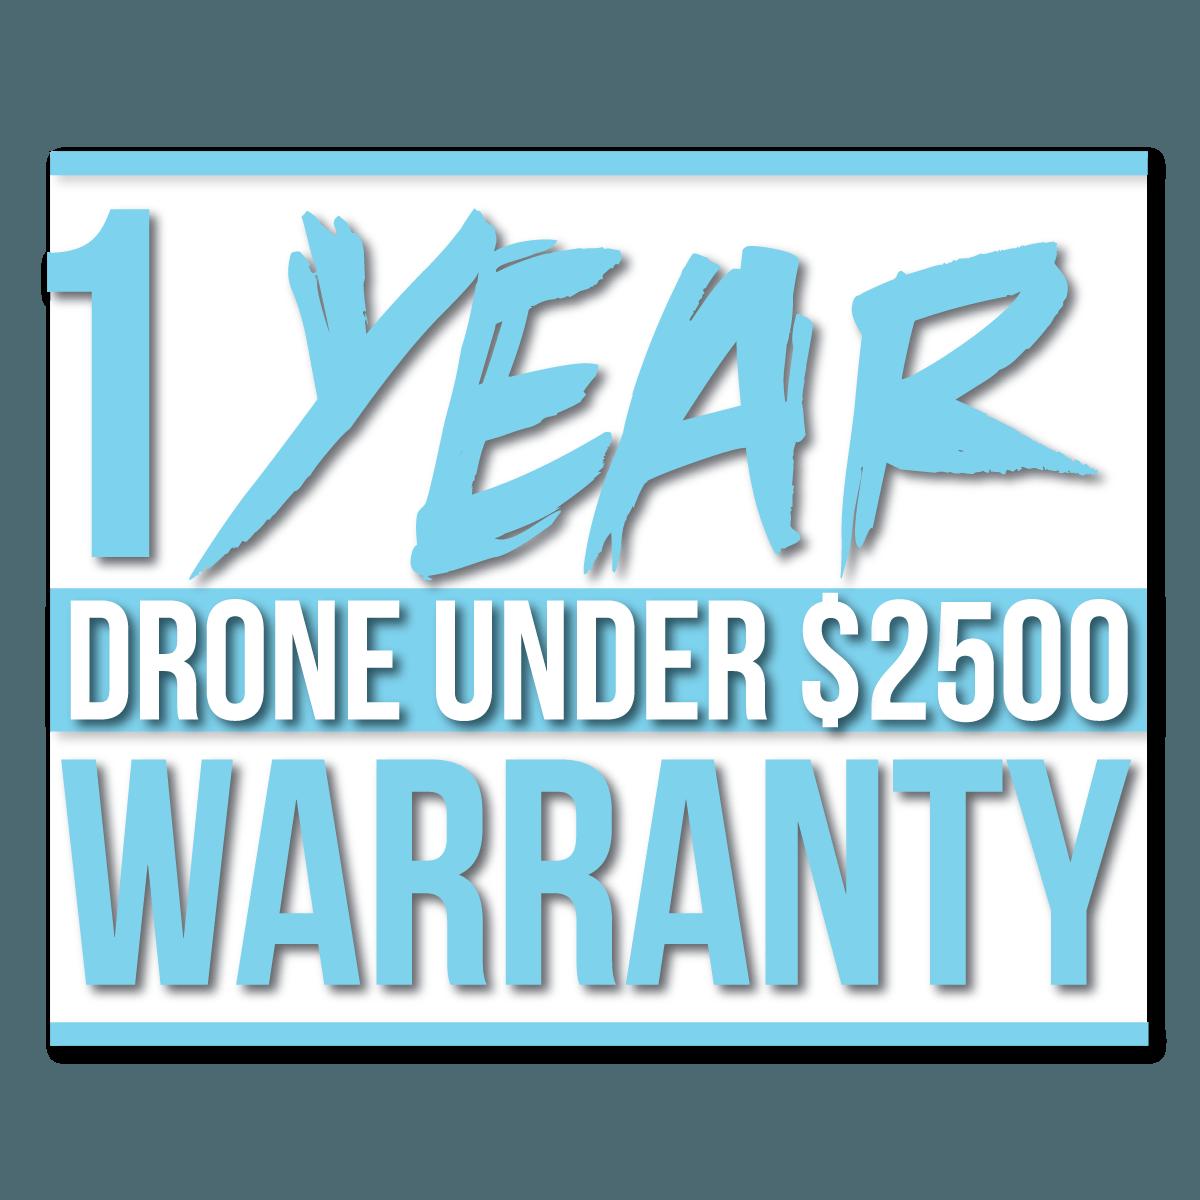 cps-warranty-verydrone-2500-phantom-4-pro-mavic